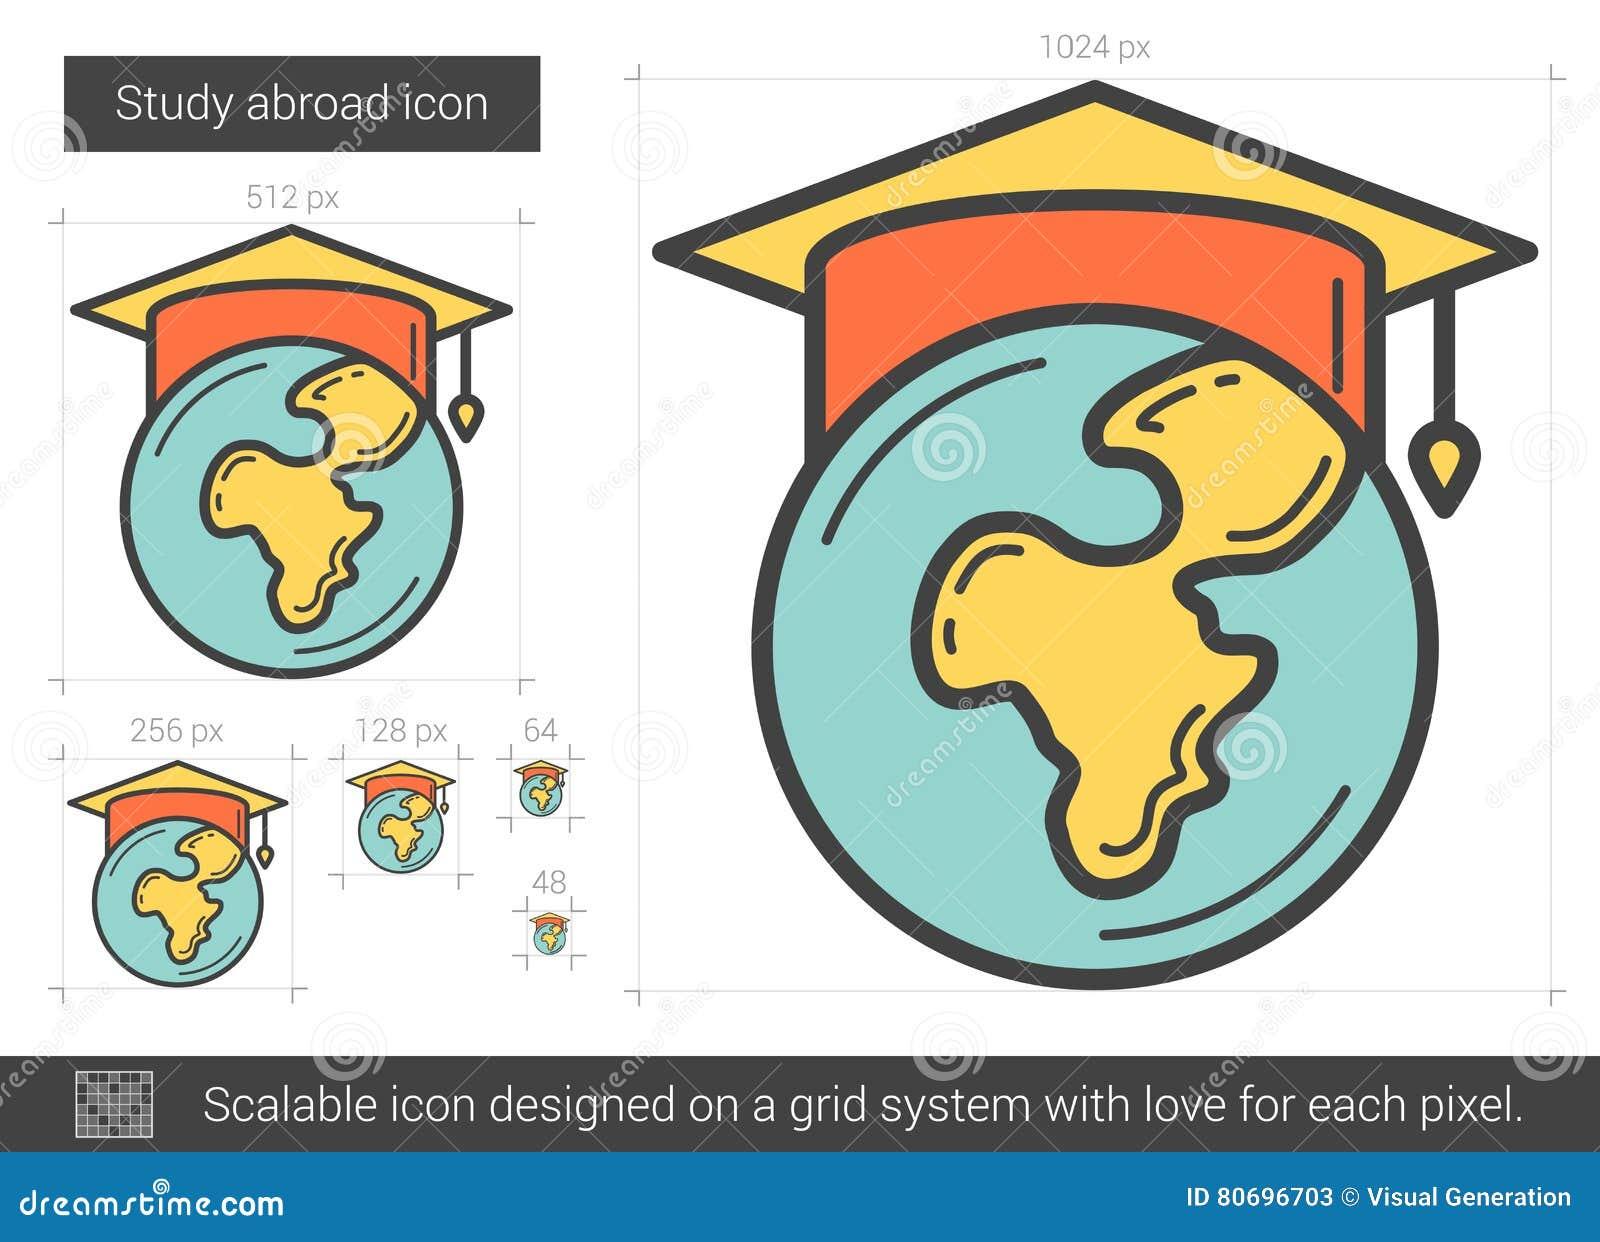 Studien utomlands fodrar symbolen